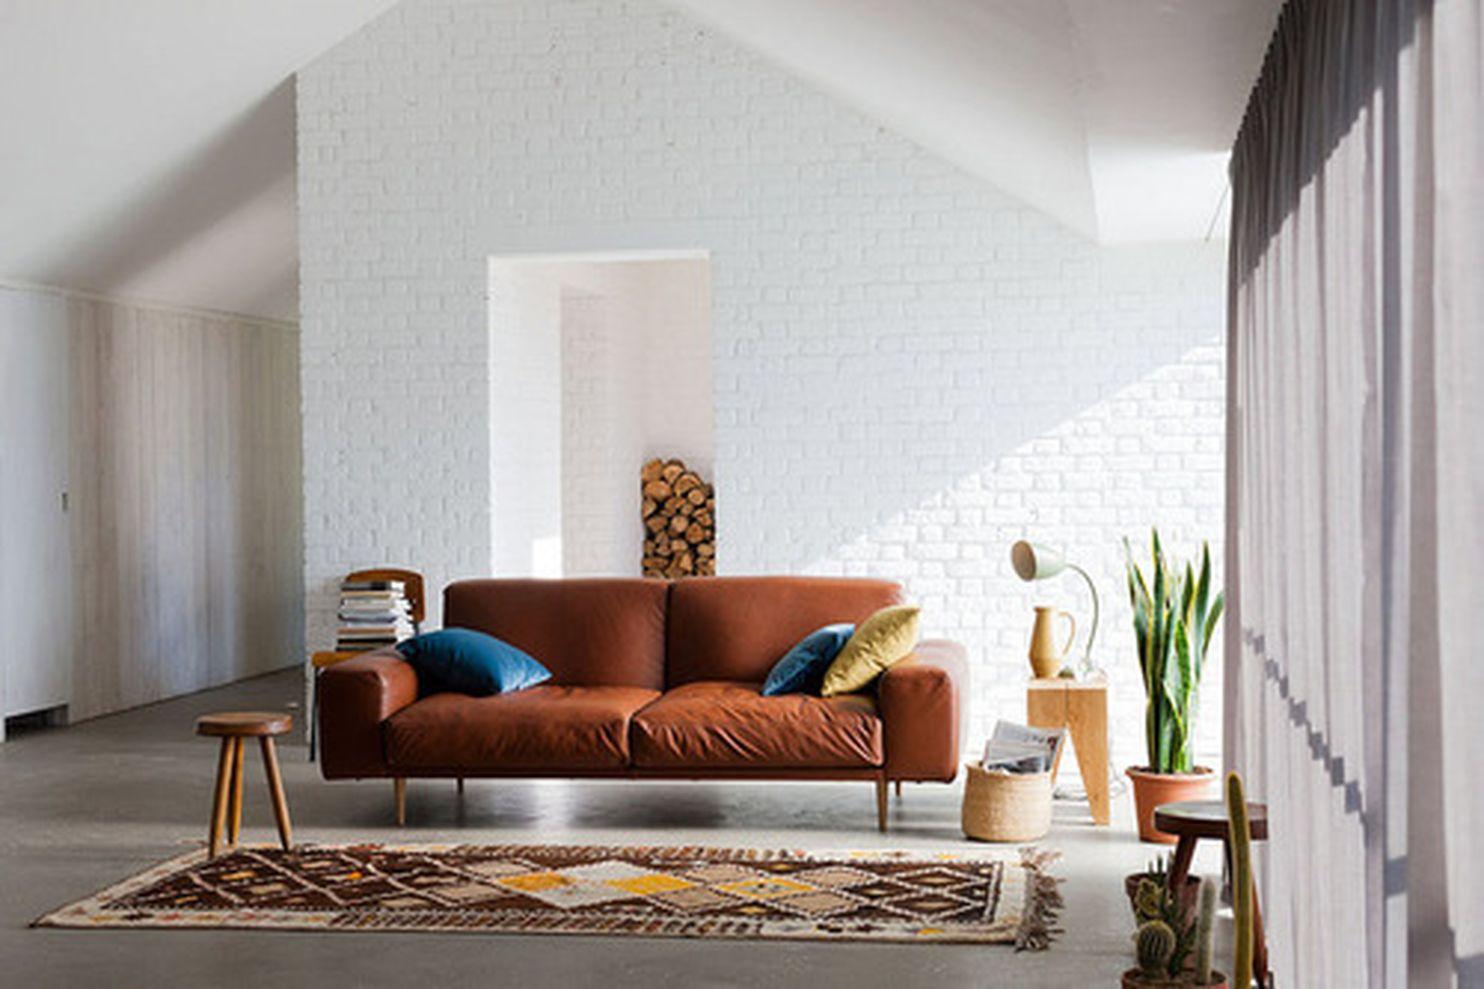 Famous Teal Living Room Ideas Frieze - Living Room Design Ideas ...